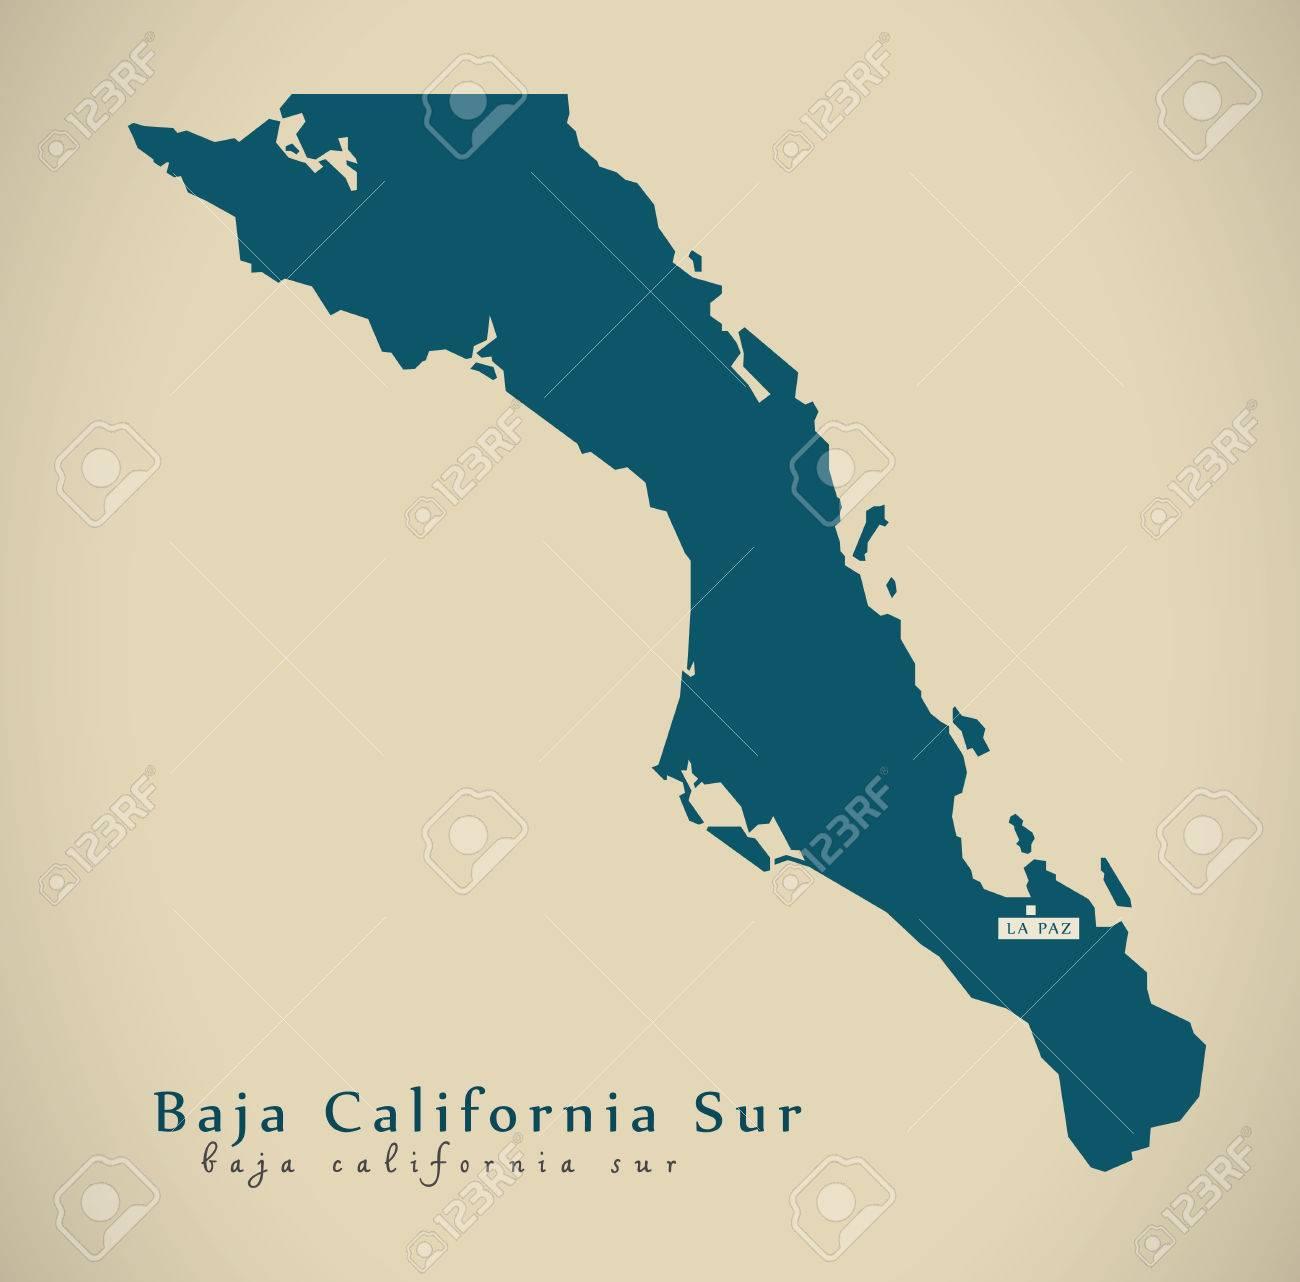 Baja California Map Mexico.Modern Map Baja California Sur Mexico Mx Illustration Stock Photo